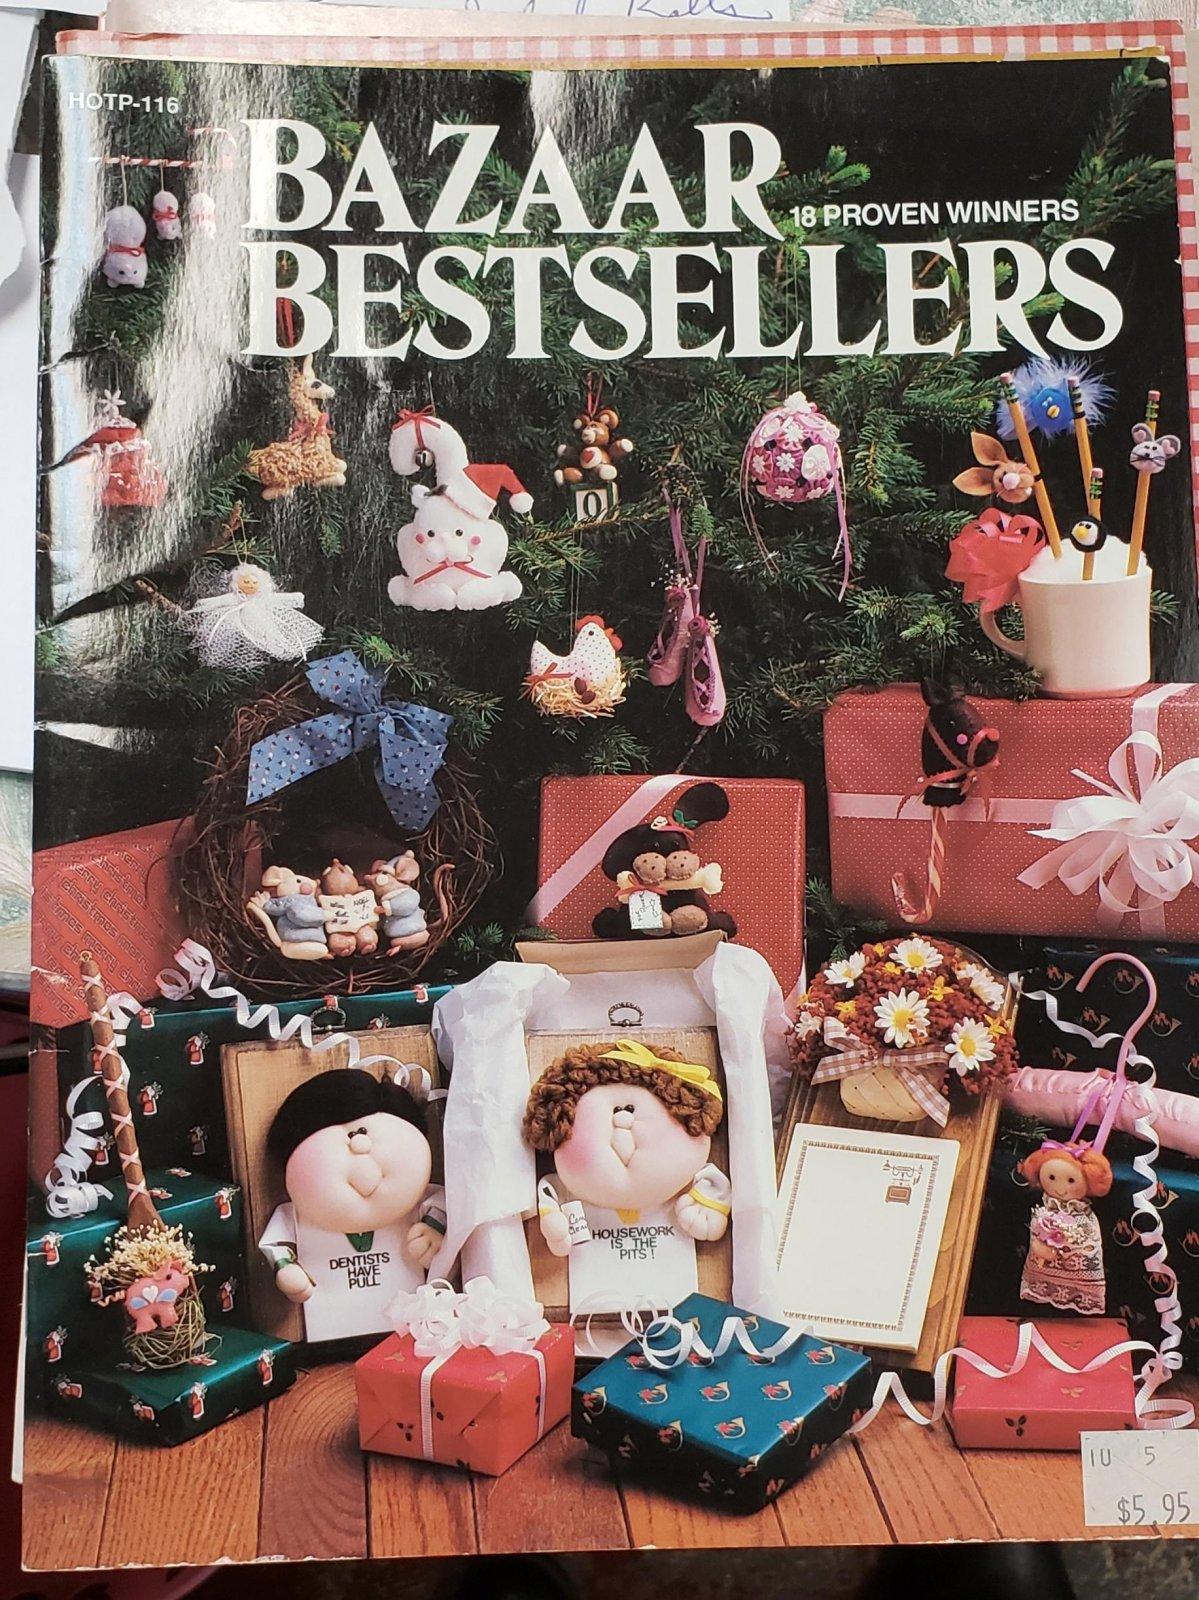 Bazaar Best Sellers - 18 Proven Winners HOTP-116